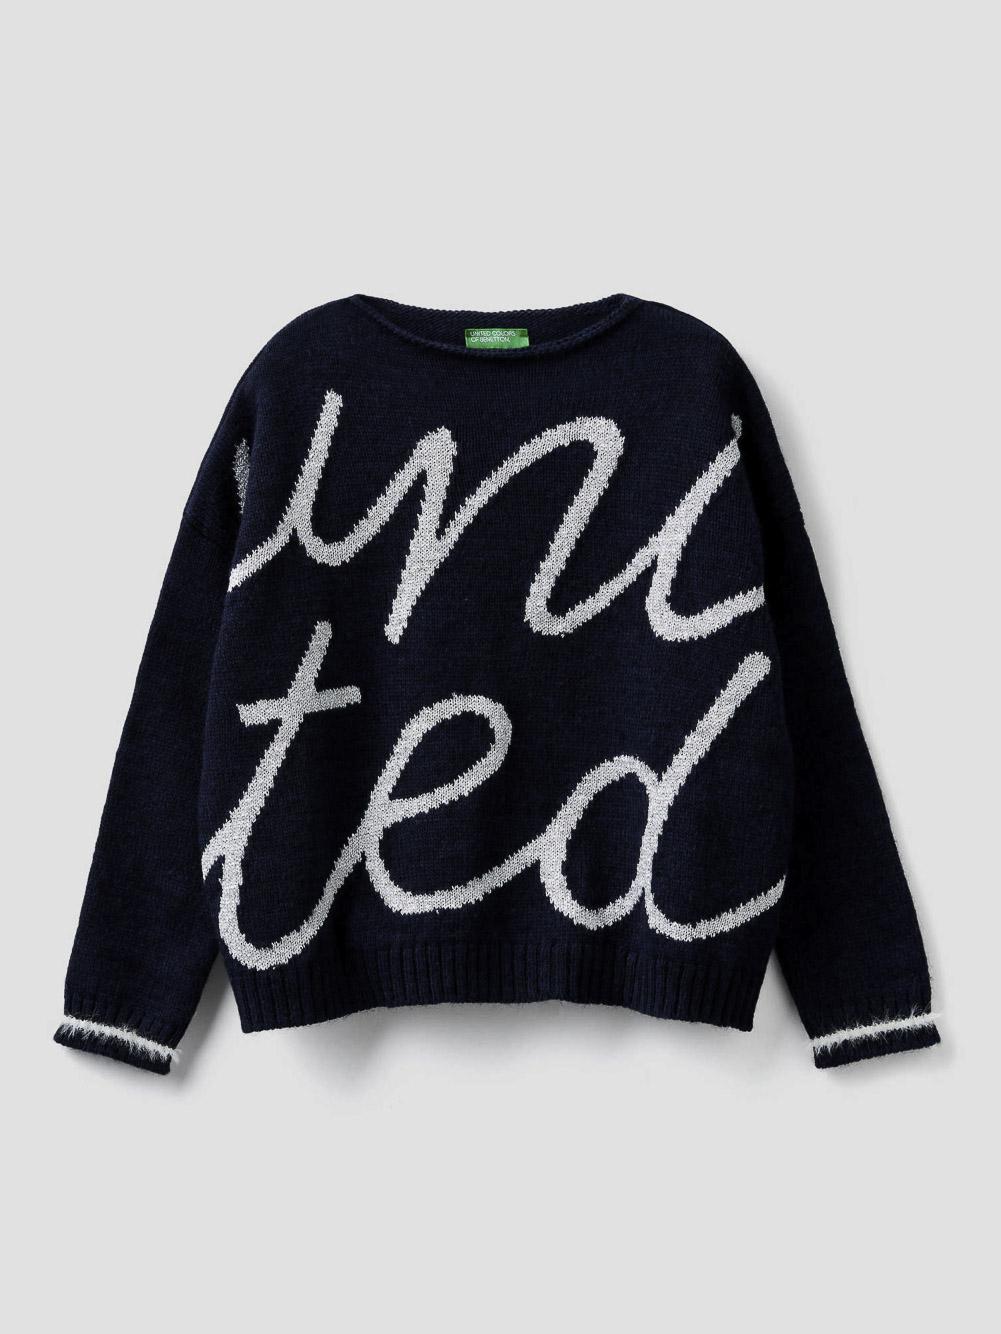 012 BENETTON Μπλούζα με μάξι λογότυπο 1176Q1928 20A901